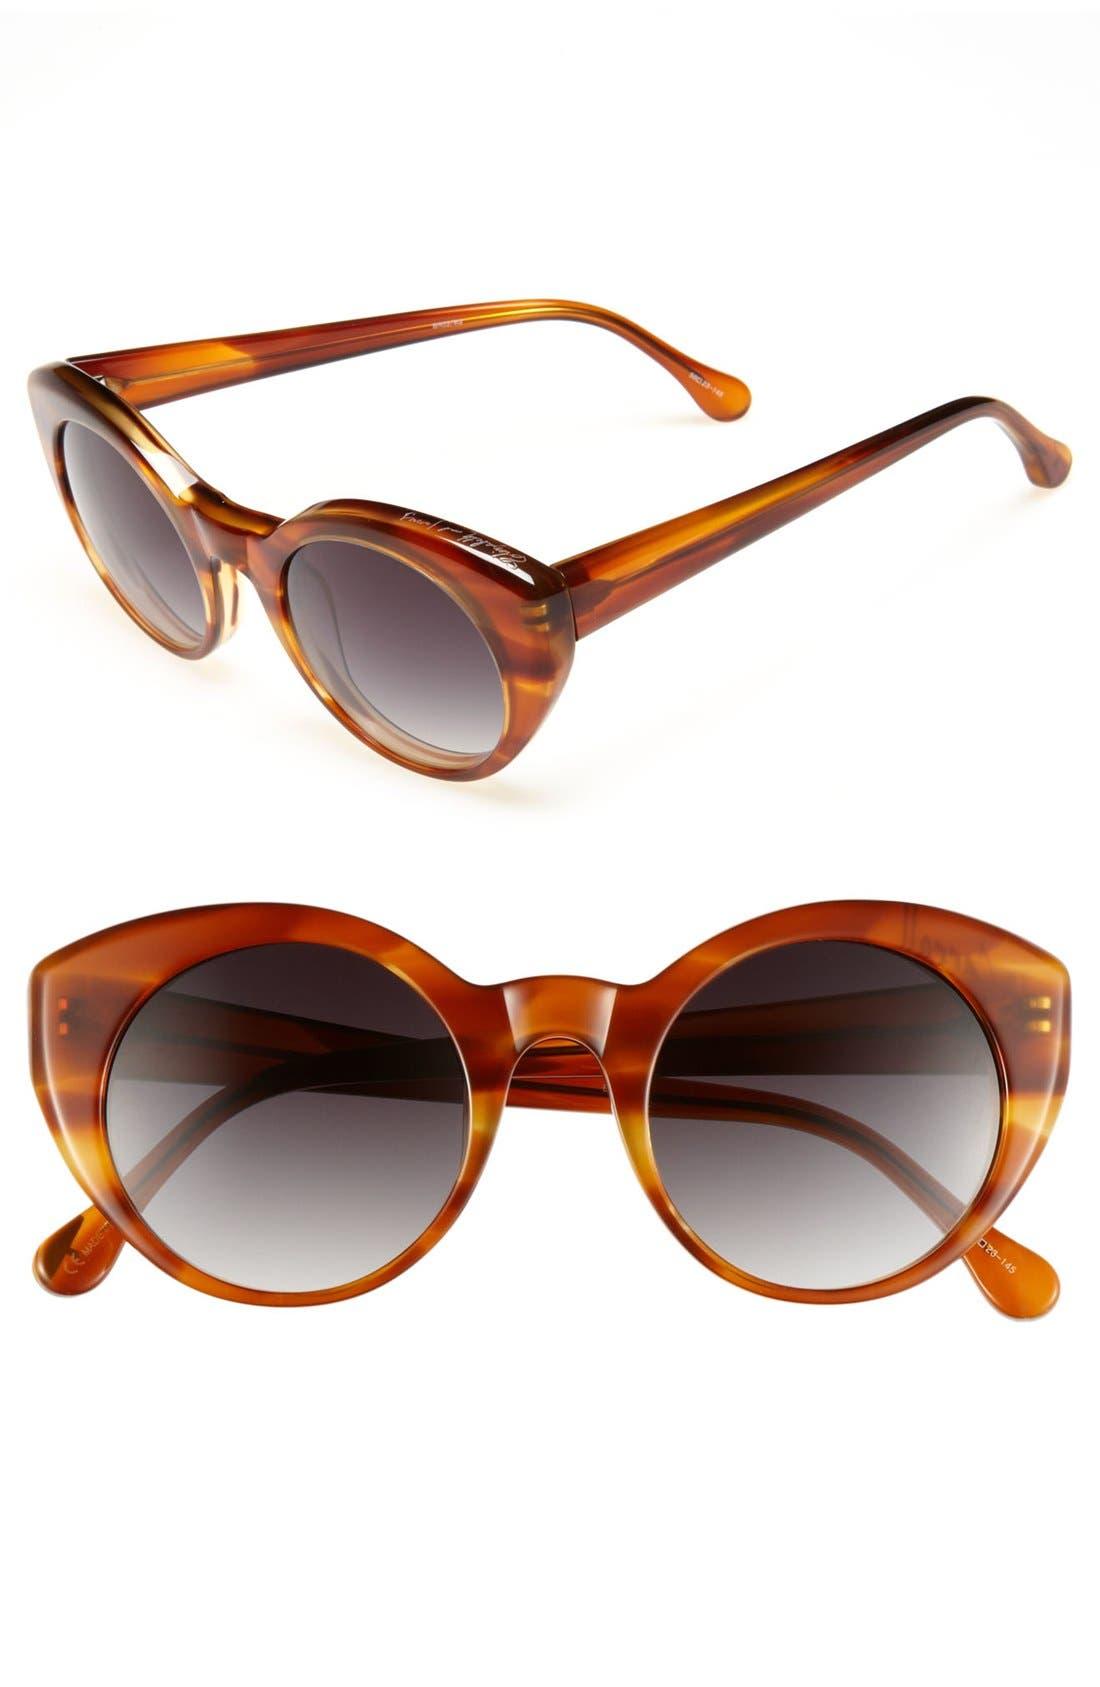 Main Image - Elizabeth and James 50mm Retro Sunglasses